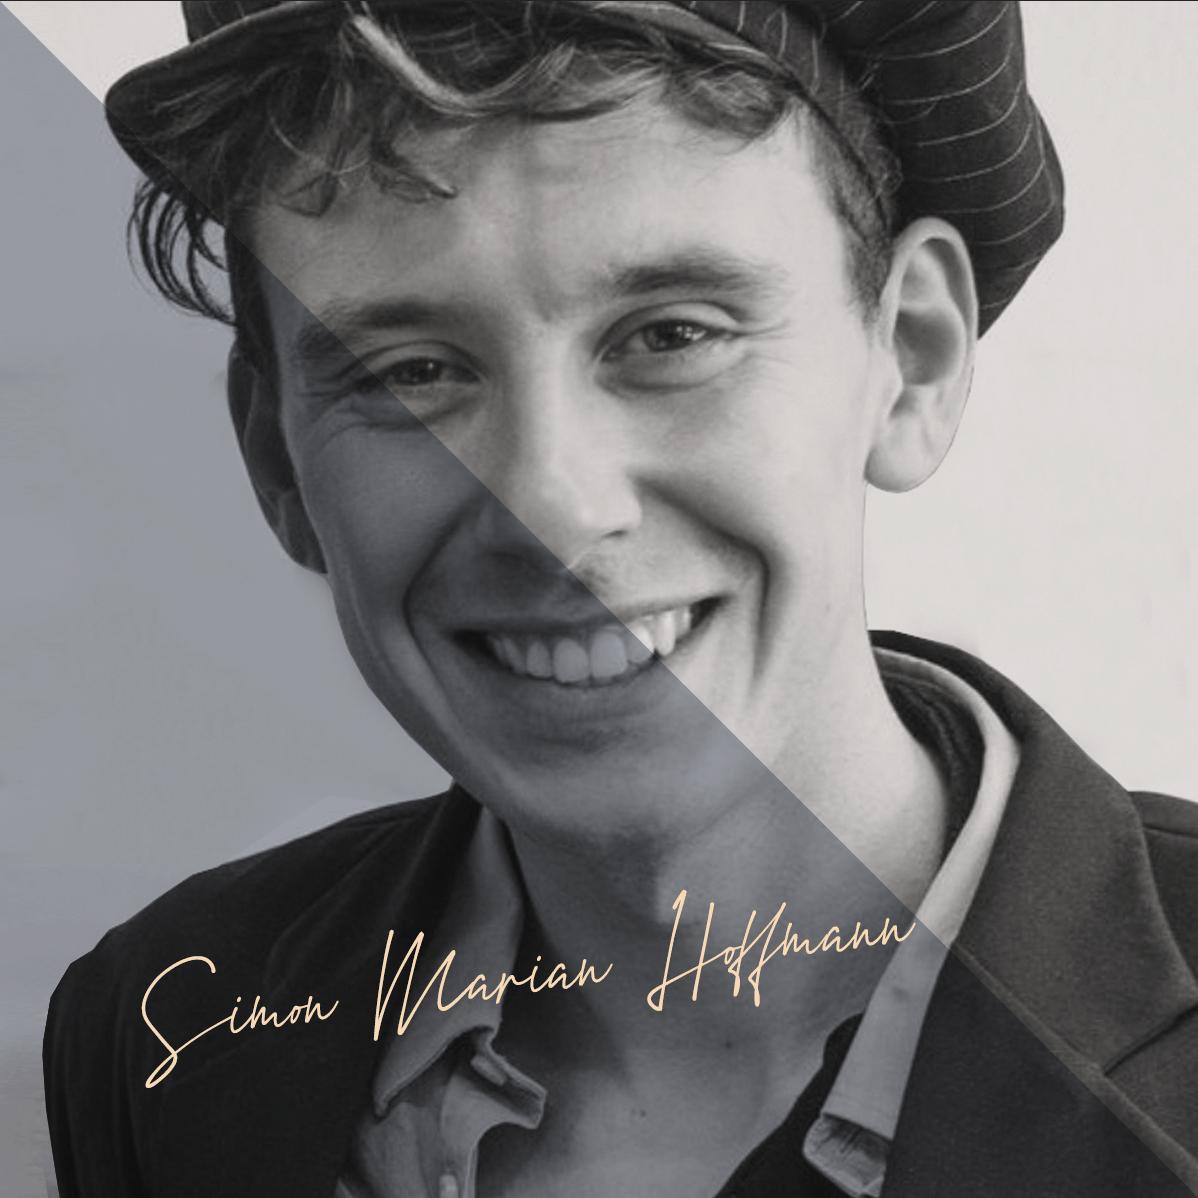 Simon Marian Hoffmann